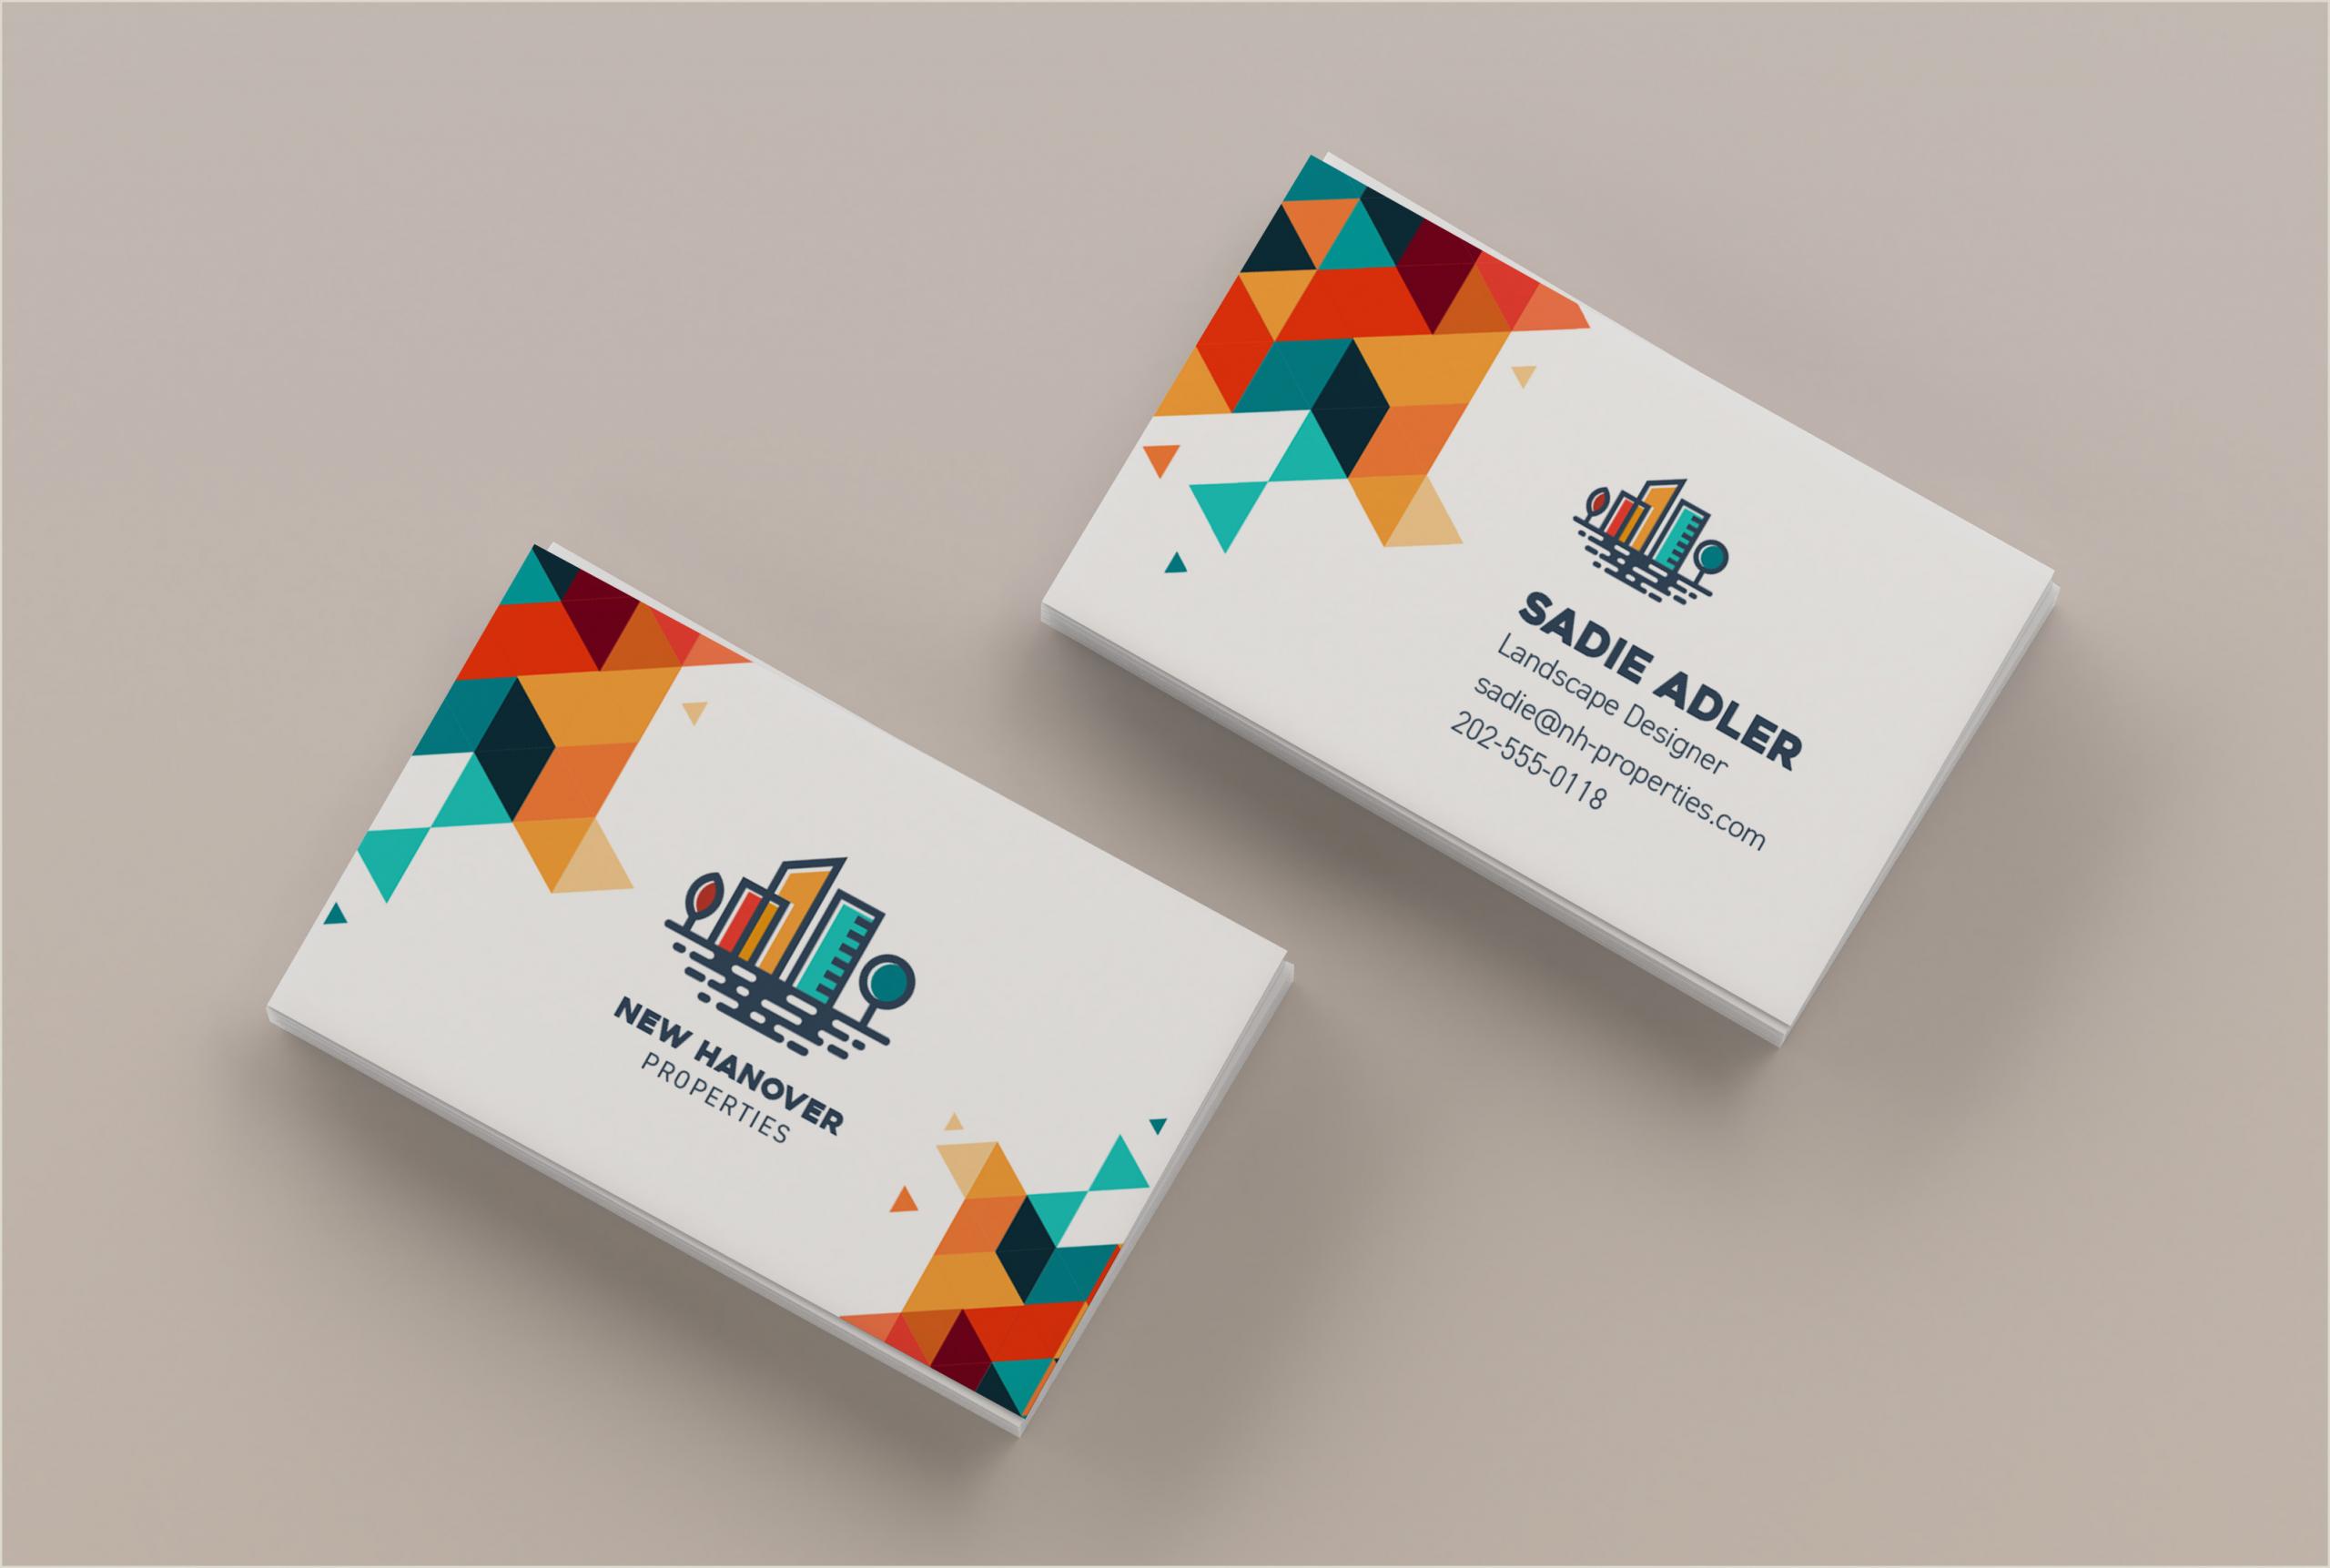 Making Business Cards In Illustrator Master Business Card Design With Adobe Illustrator Yes I M